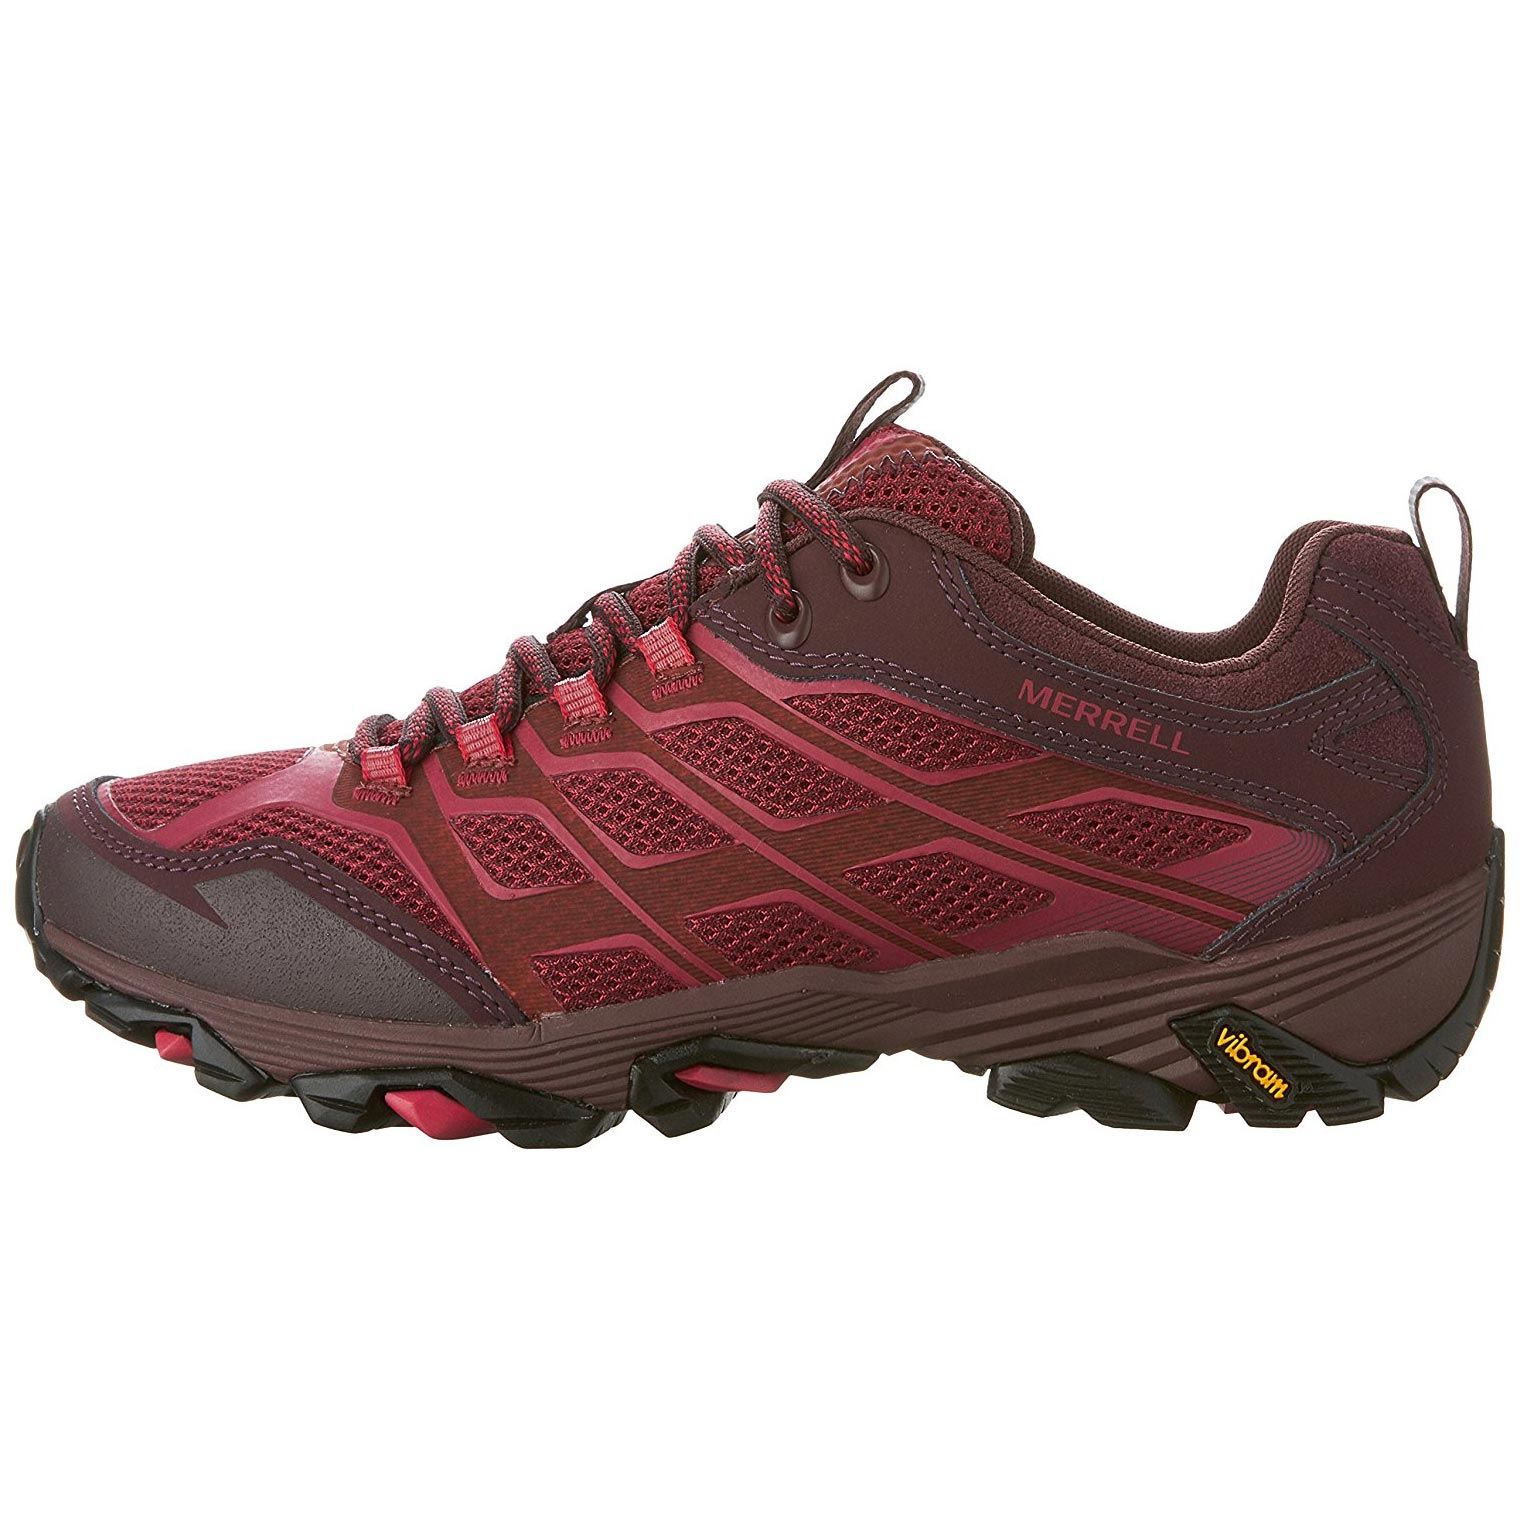 Zapatos morados Merrell Moab para mujer cc4hWL3